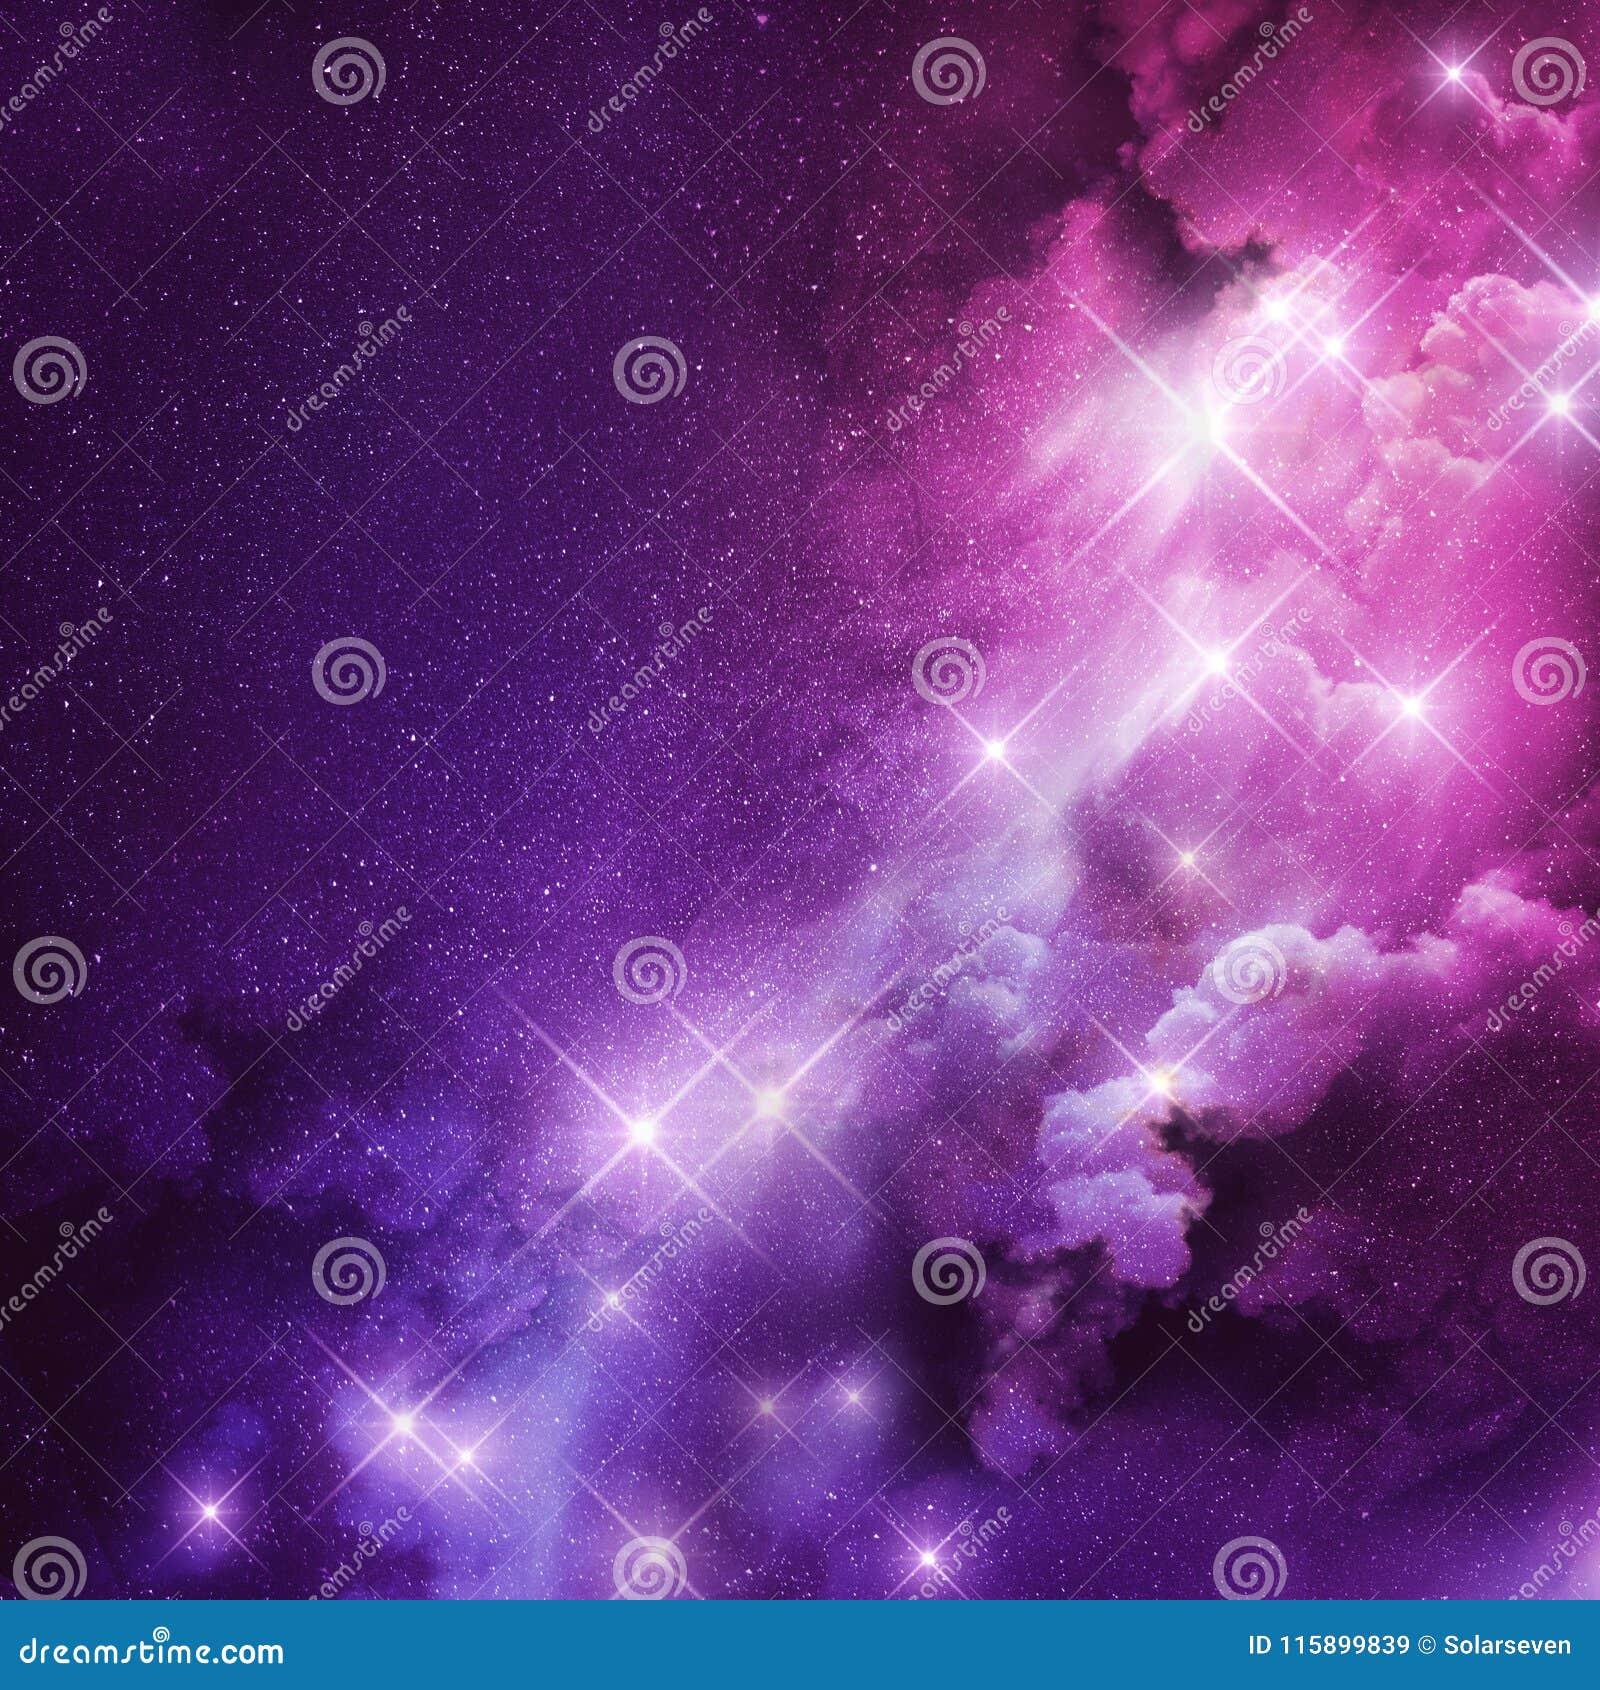 Pink and Purple Nebula